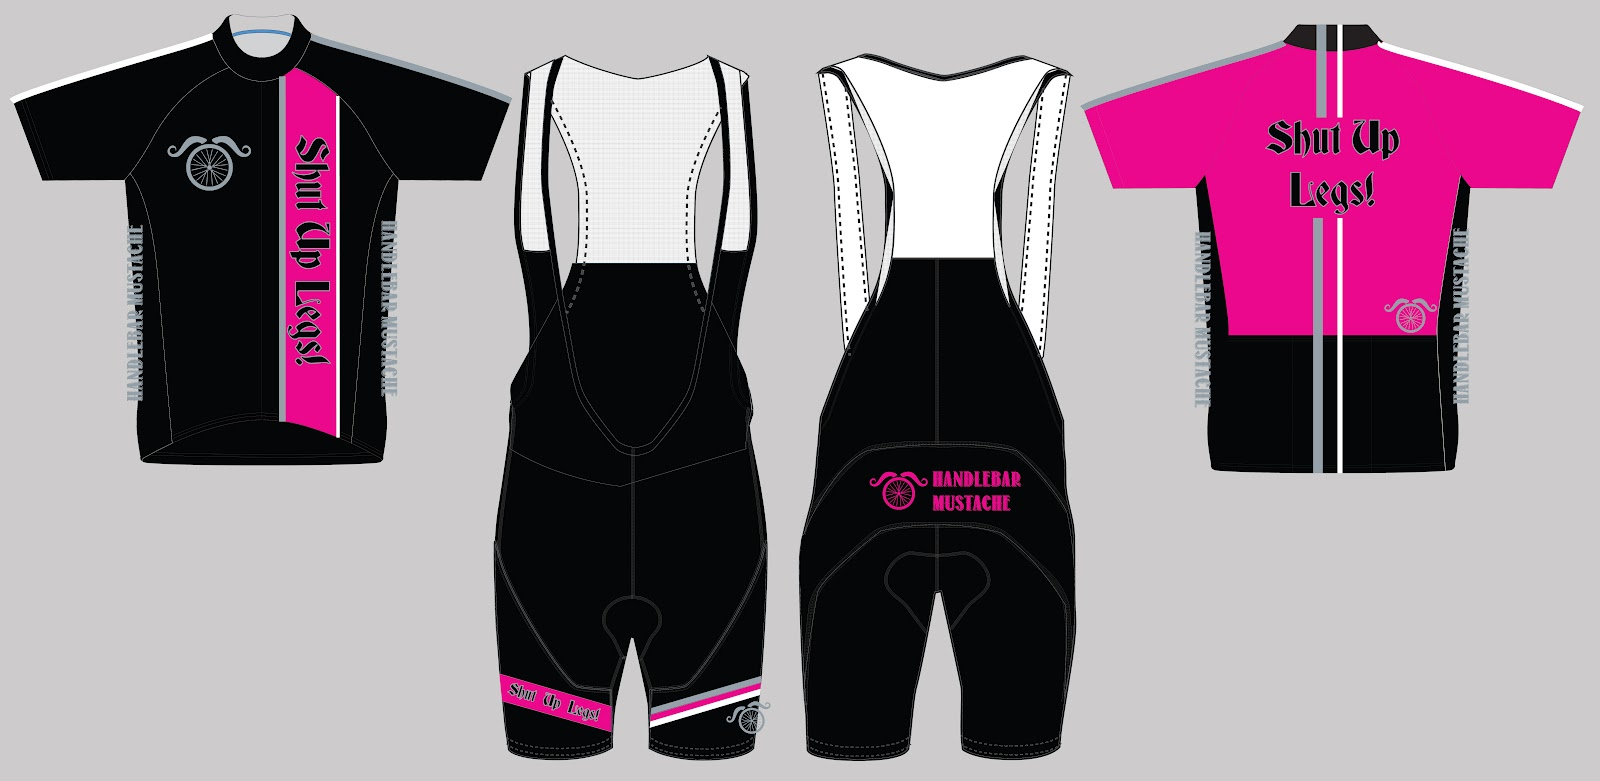 http://2.bp.blogspot.com/-ZgMlxzlKQk0/T1bWgaczdFI/AAAAAAAAA9A/856bY1sW5b0/s1600/Kit+Feb+2012_pink.jpg